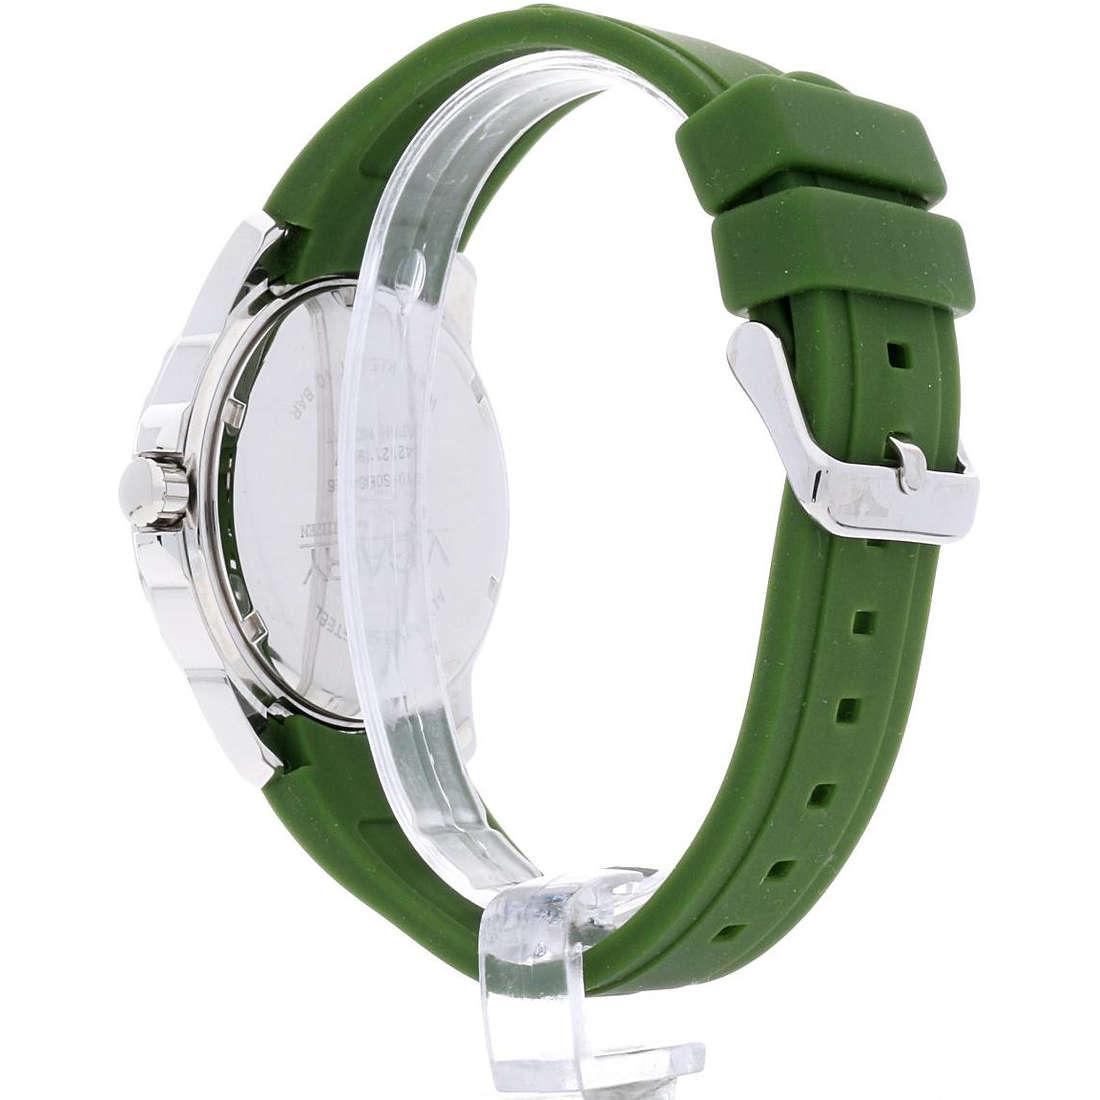 offerte orologi uomo Vagary By Citizen ID9-817-56